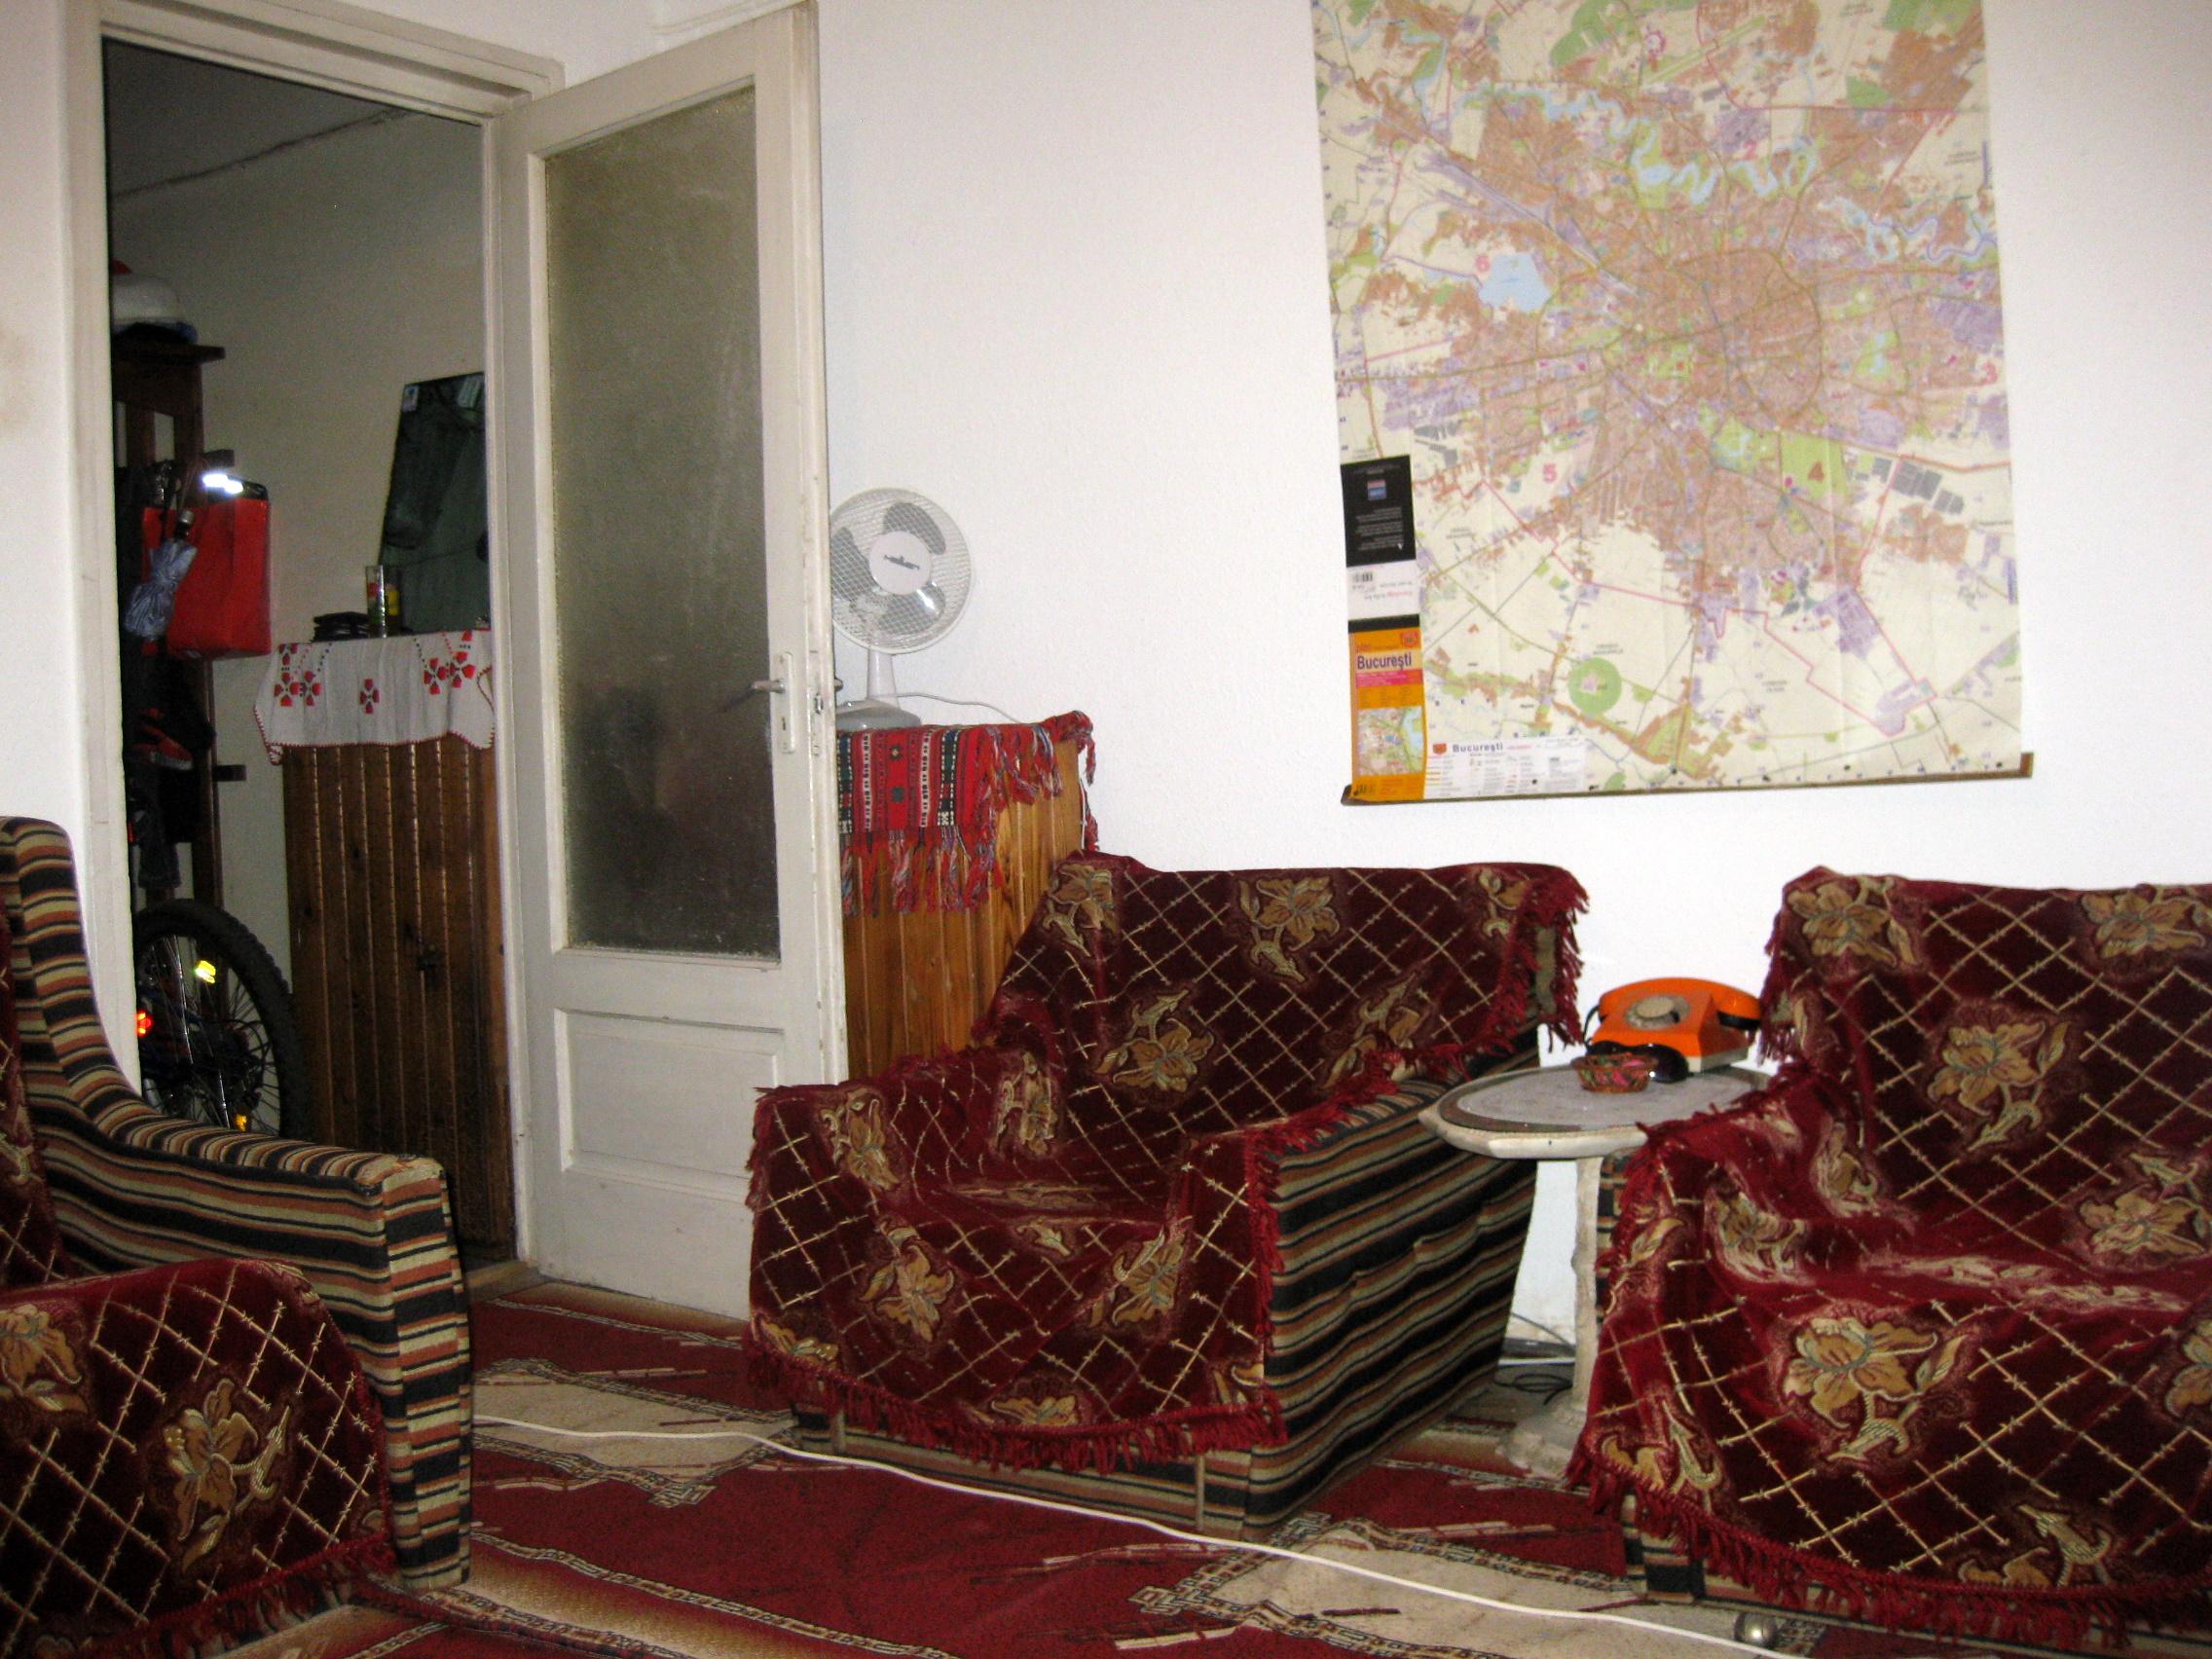 Verkoop 2 slaapkamers bucuresti bucharest roemenie bdl dinicu golescu 39 bl 5 sc 1 parter - Slaapkamer klein gebied ...